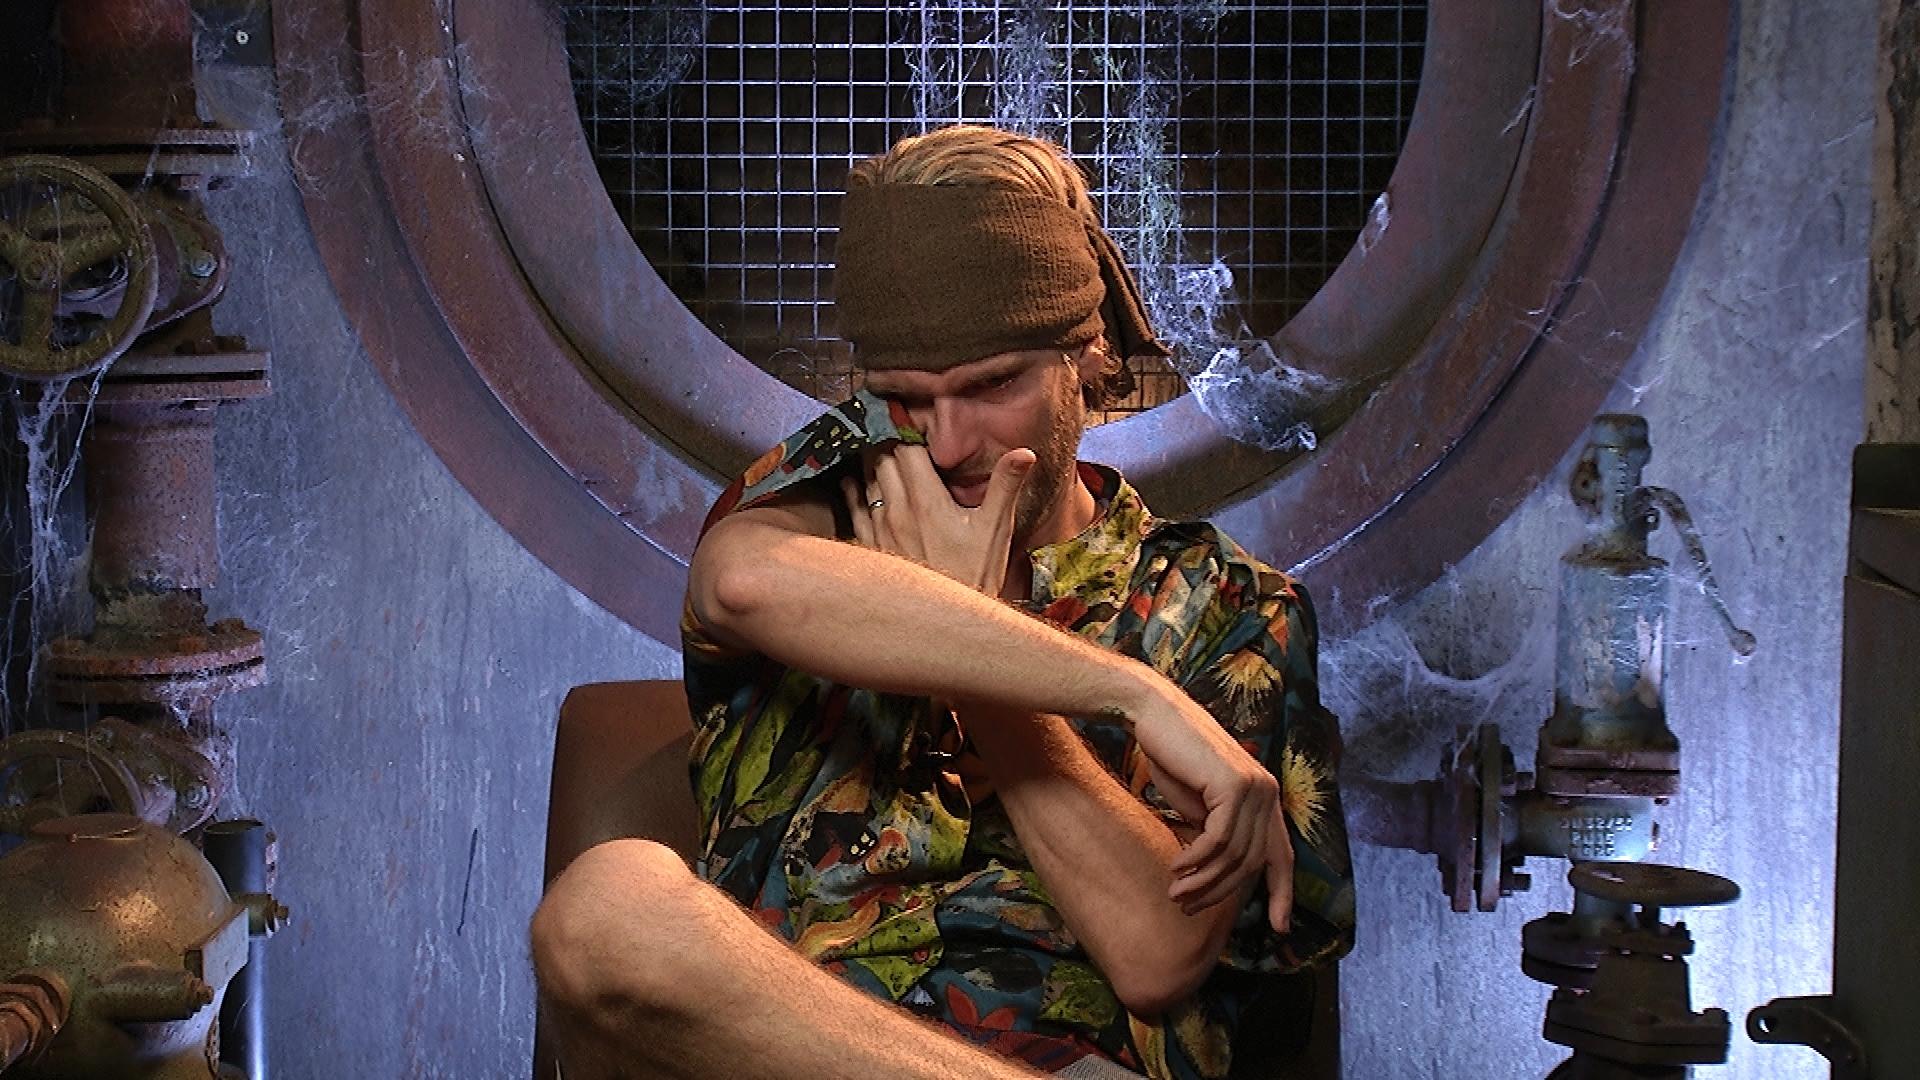 Promi Big Brother 2016 Tag 7 - Robin weint im Sprechzimmer